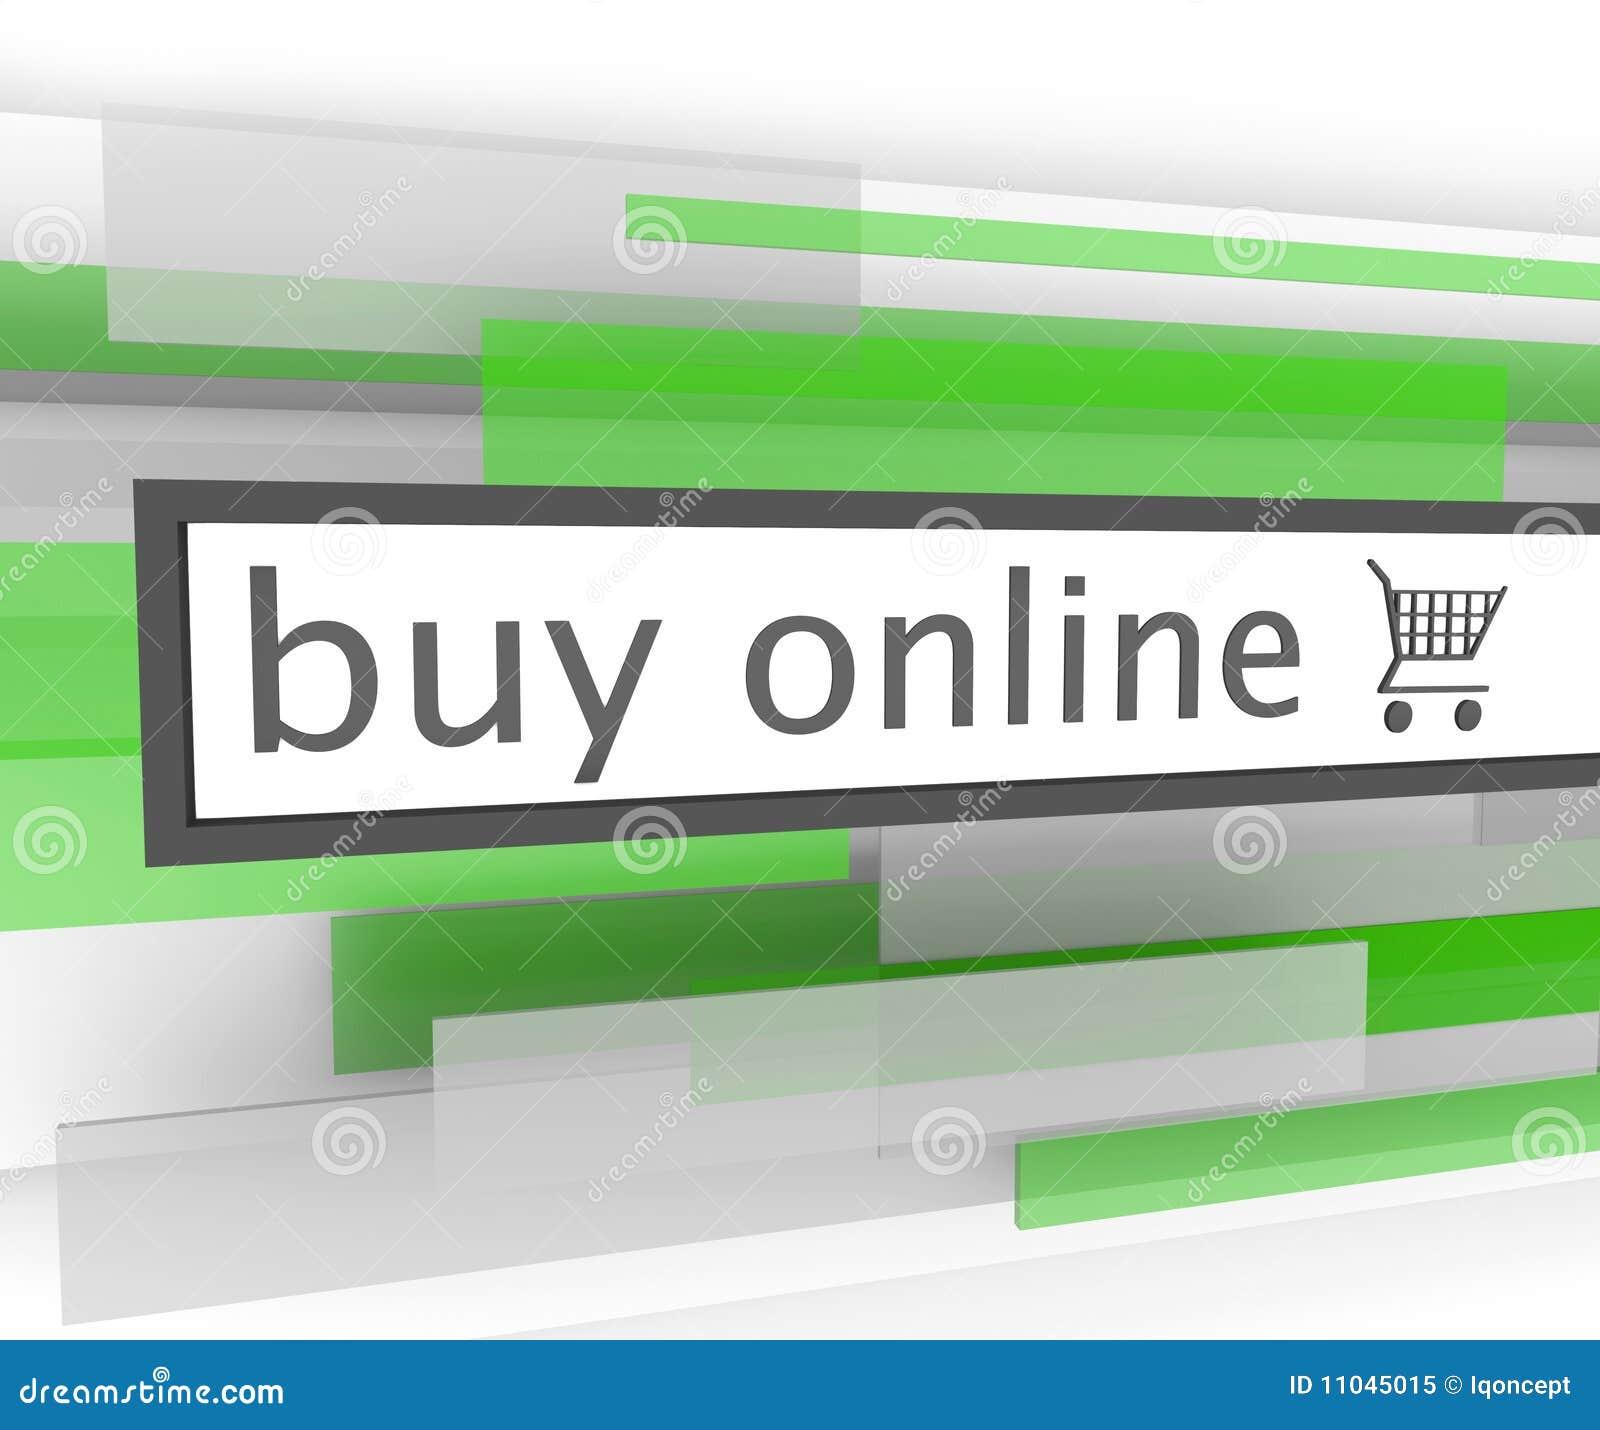 Order generic propecia online